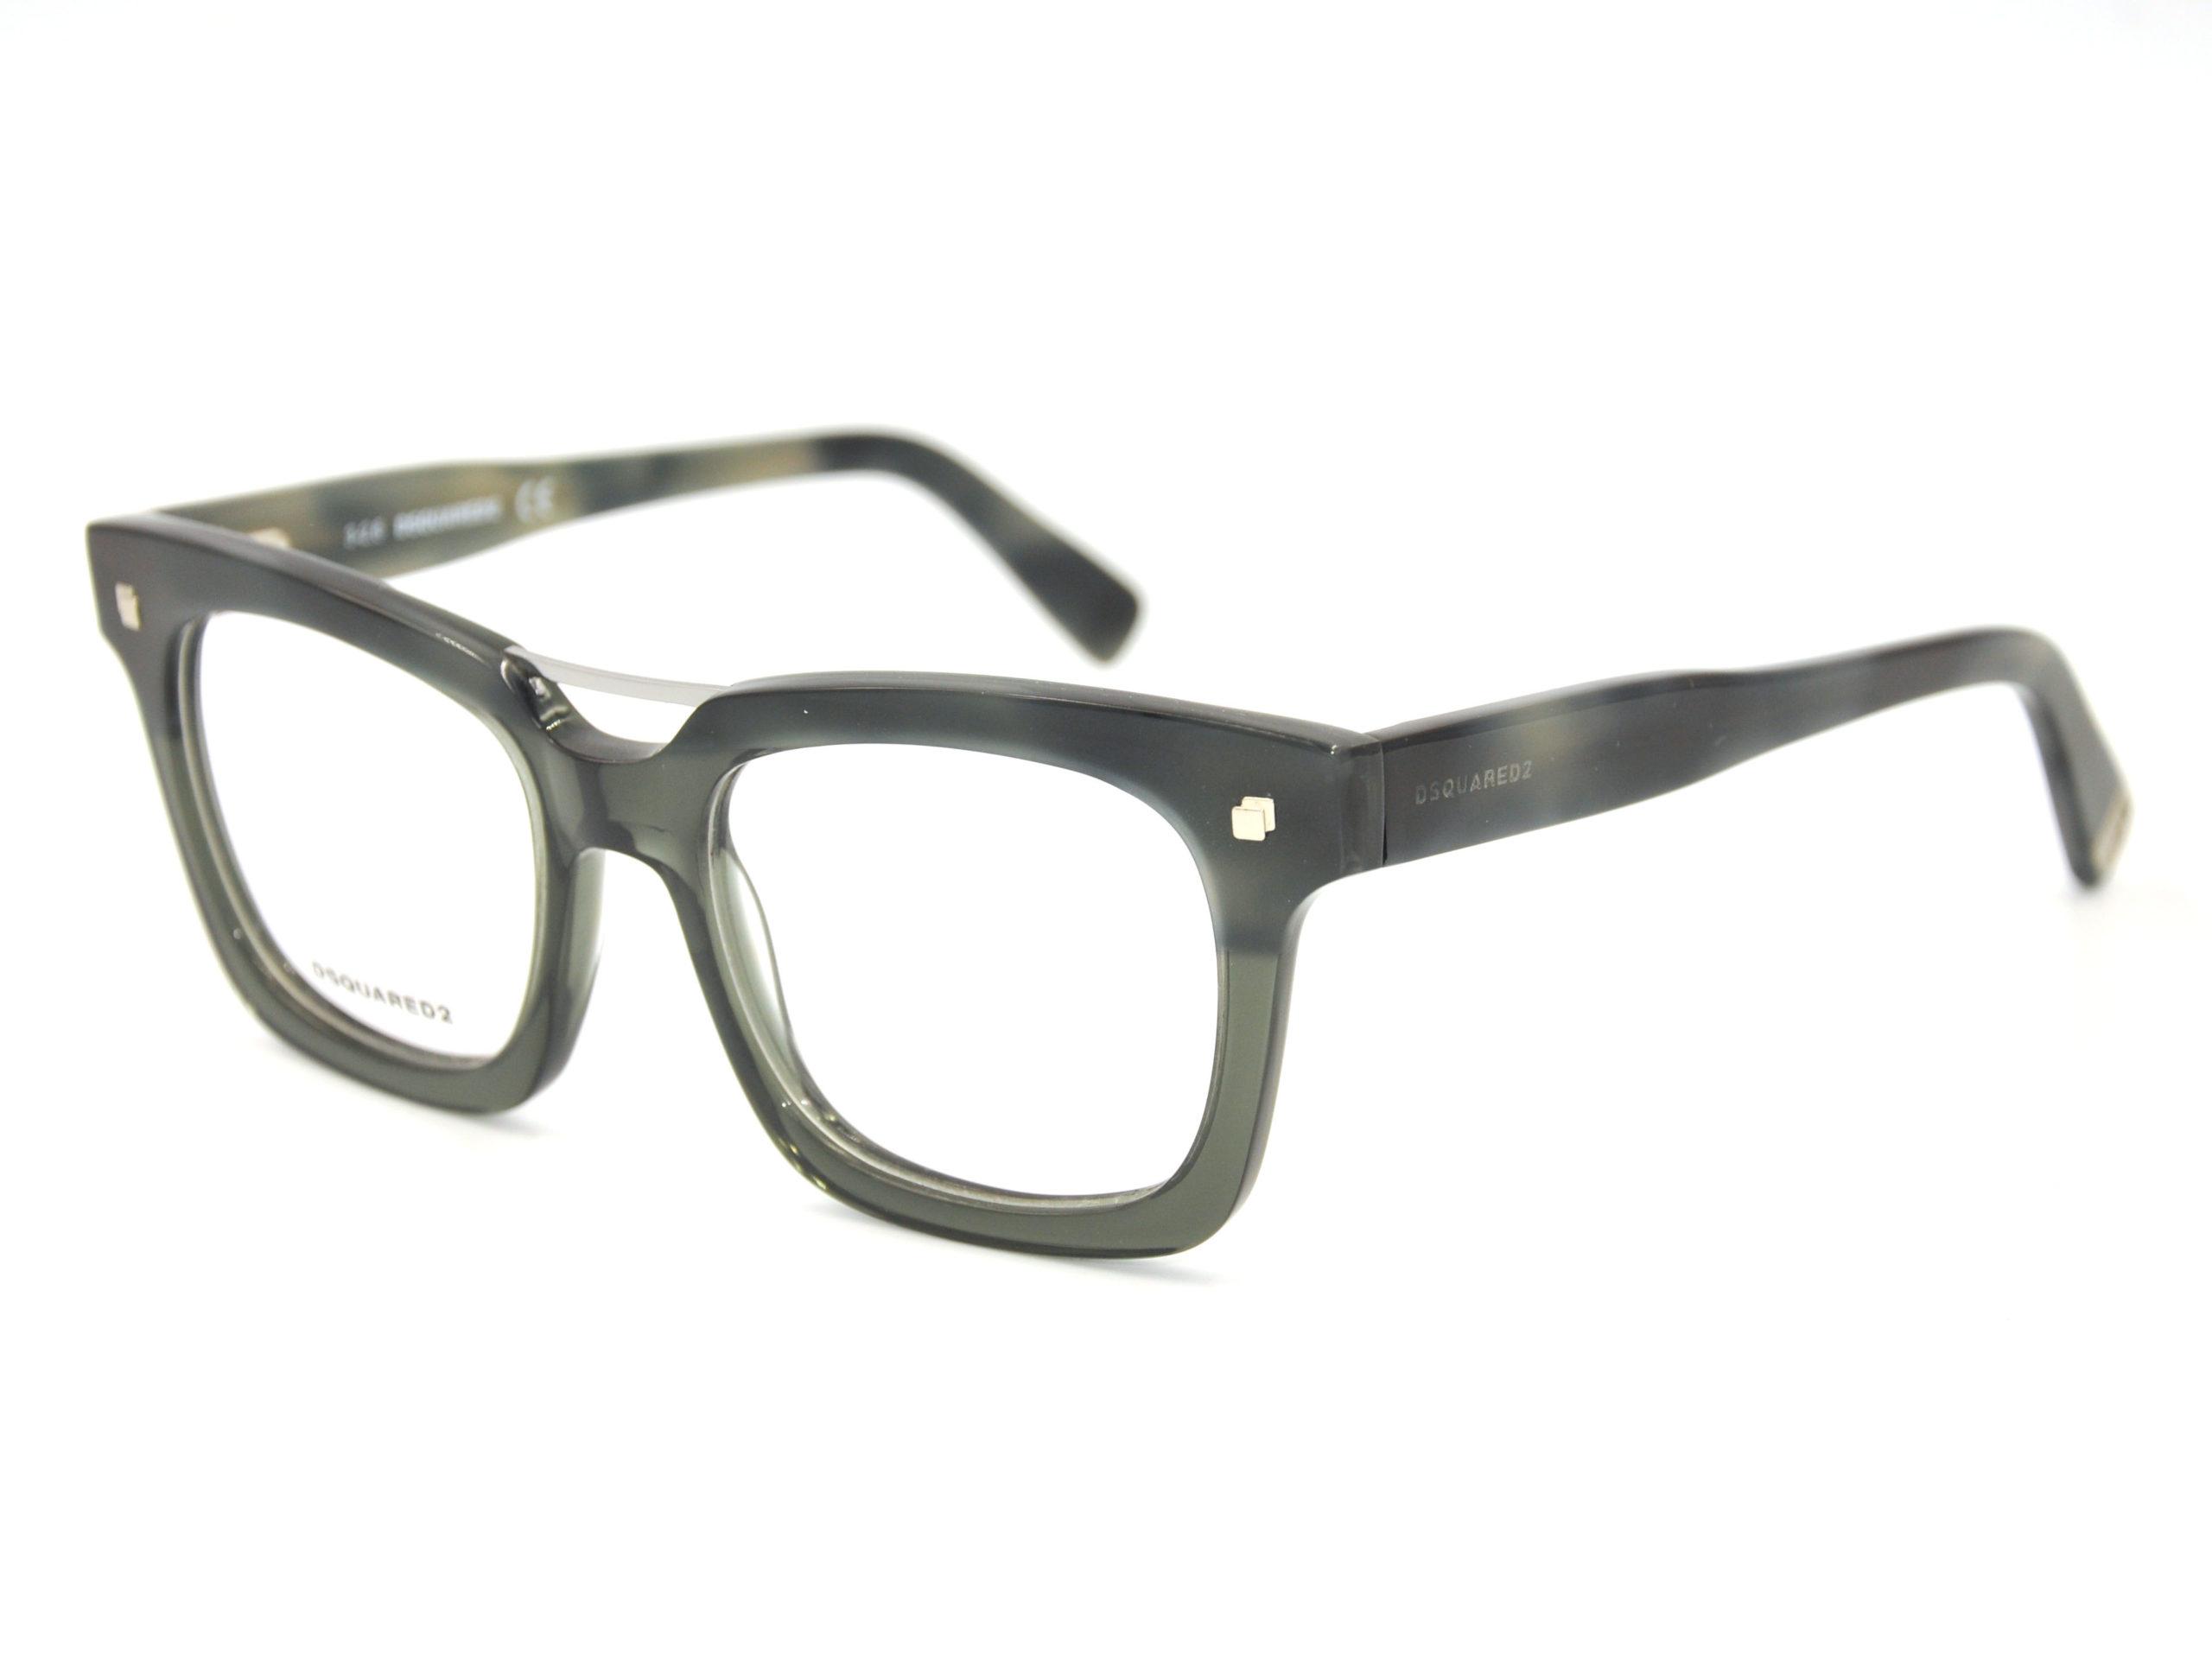 DSquared2 DQ5225 020 Prescription Glasses 2018